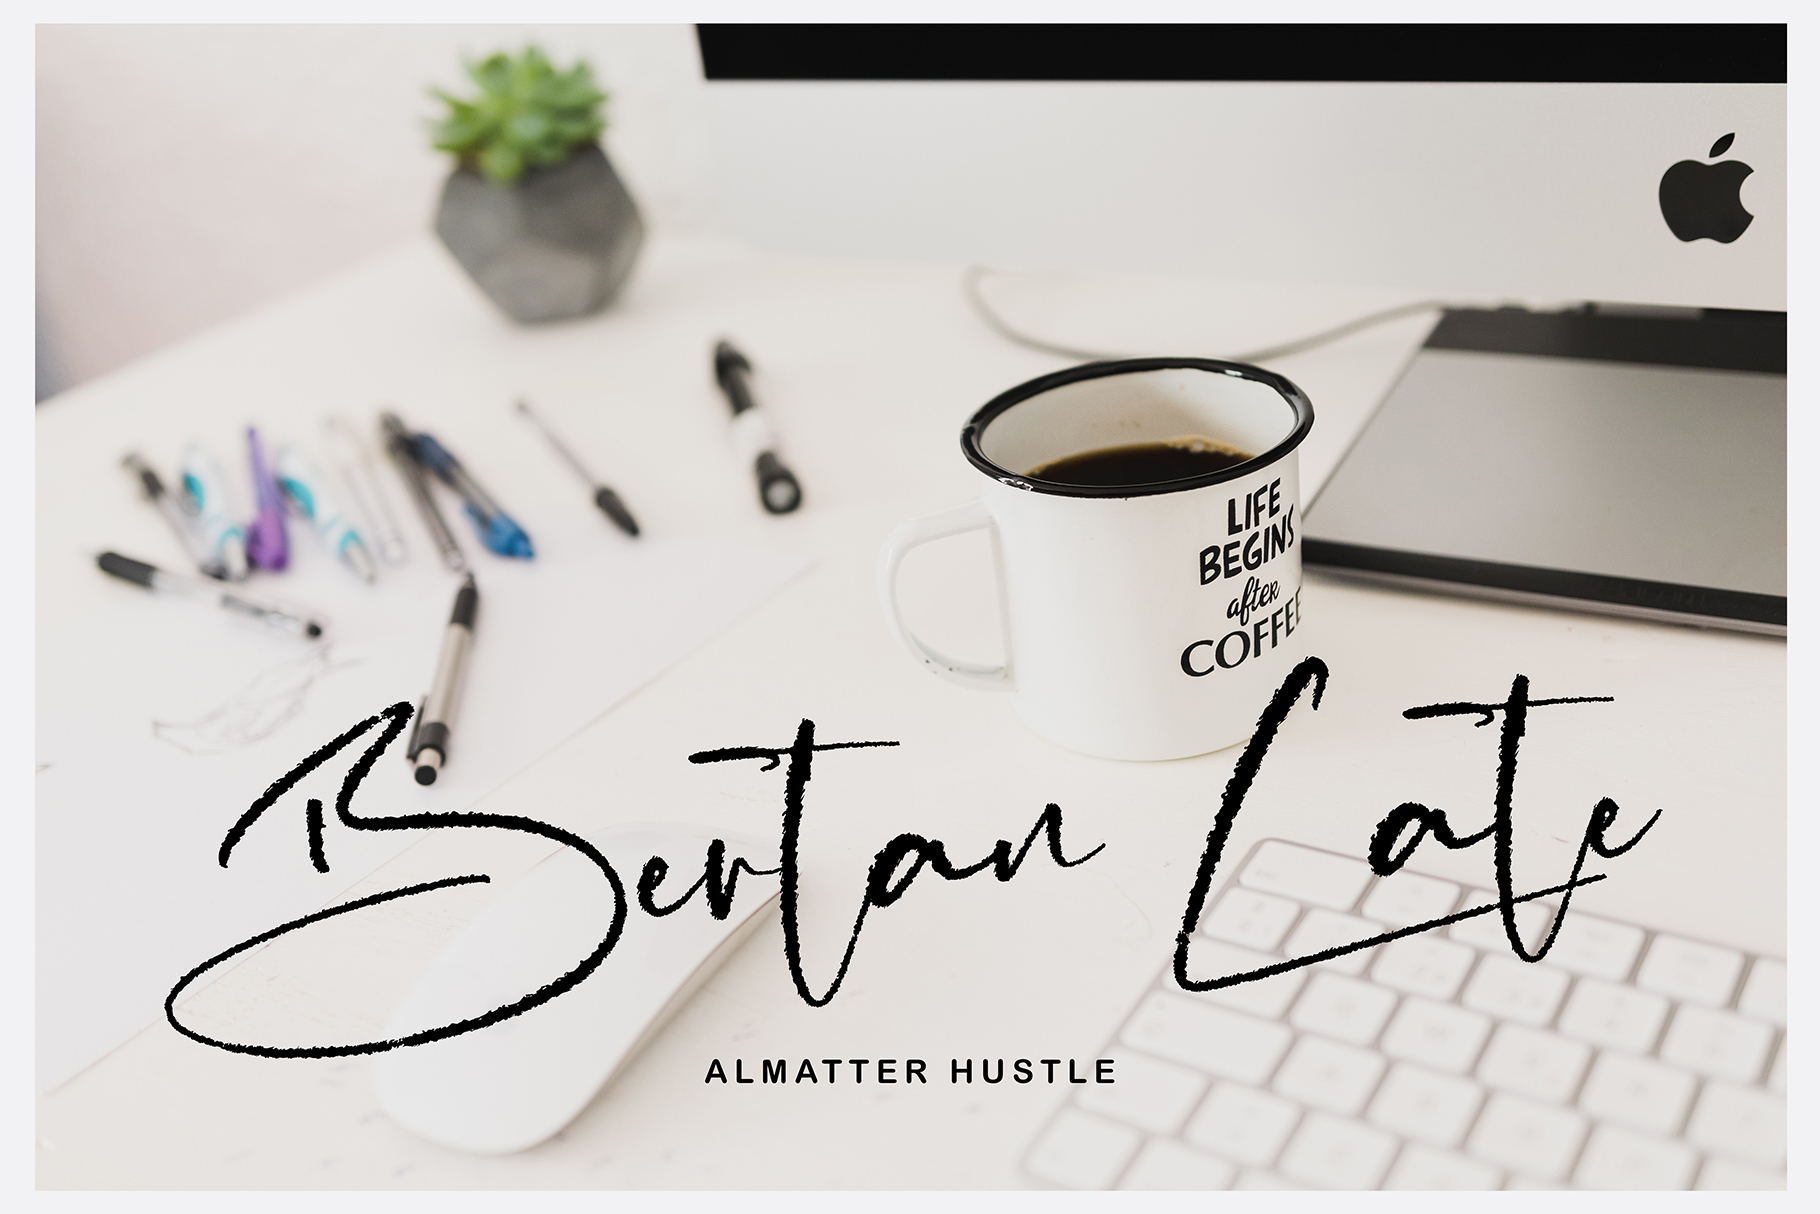 Almatter Hustle example image 3